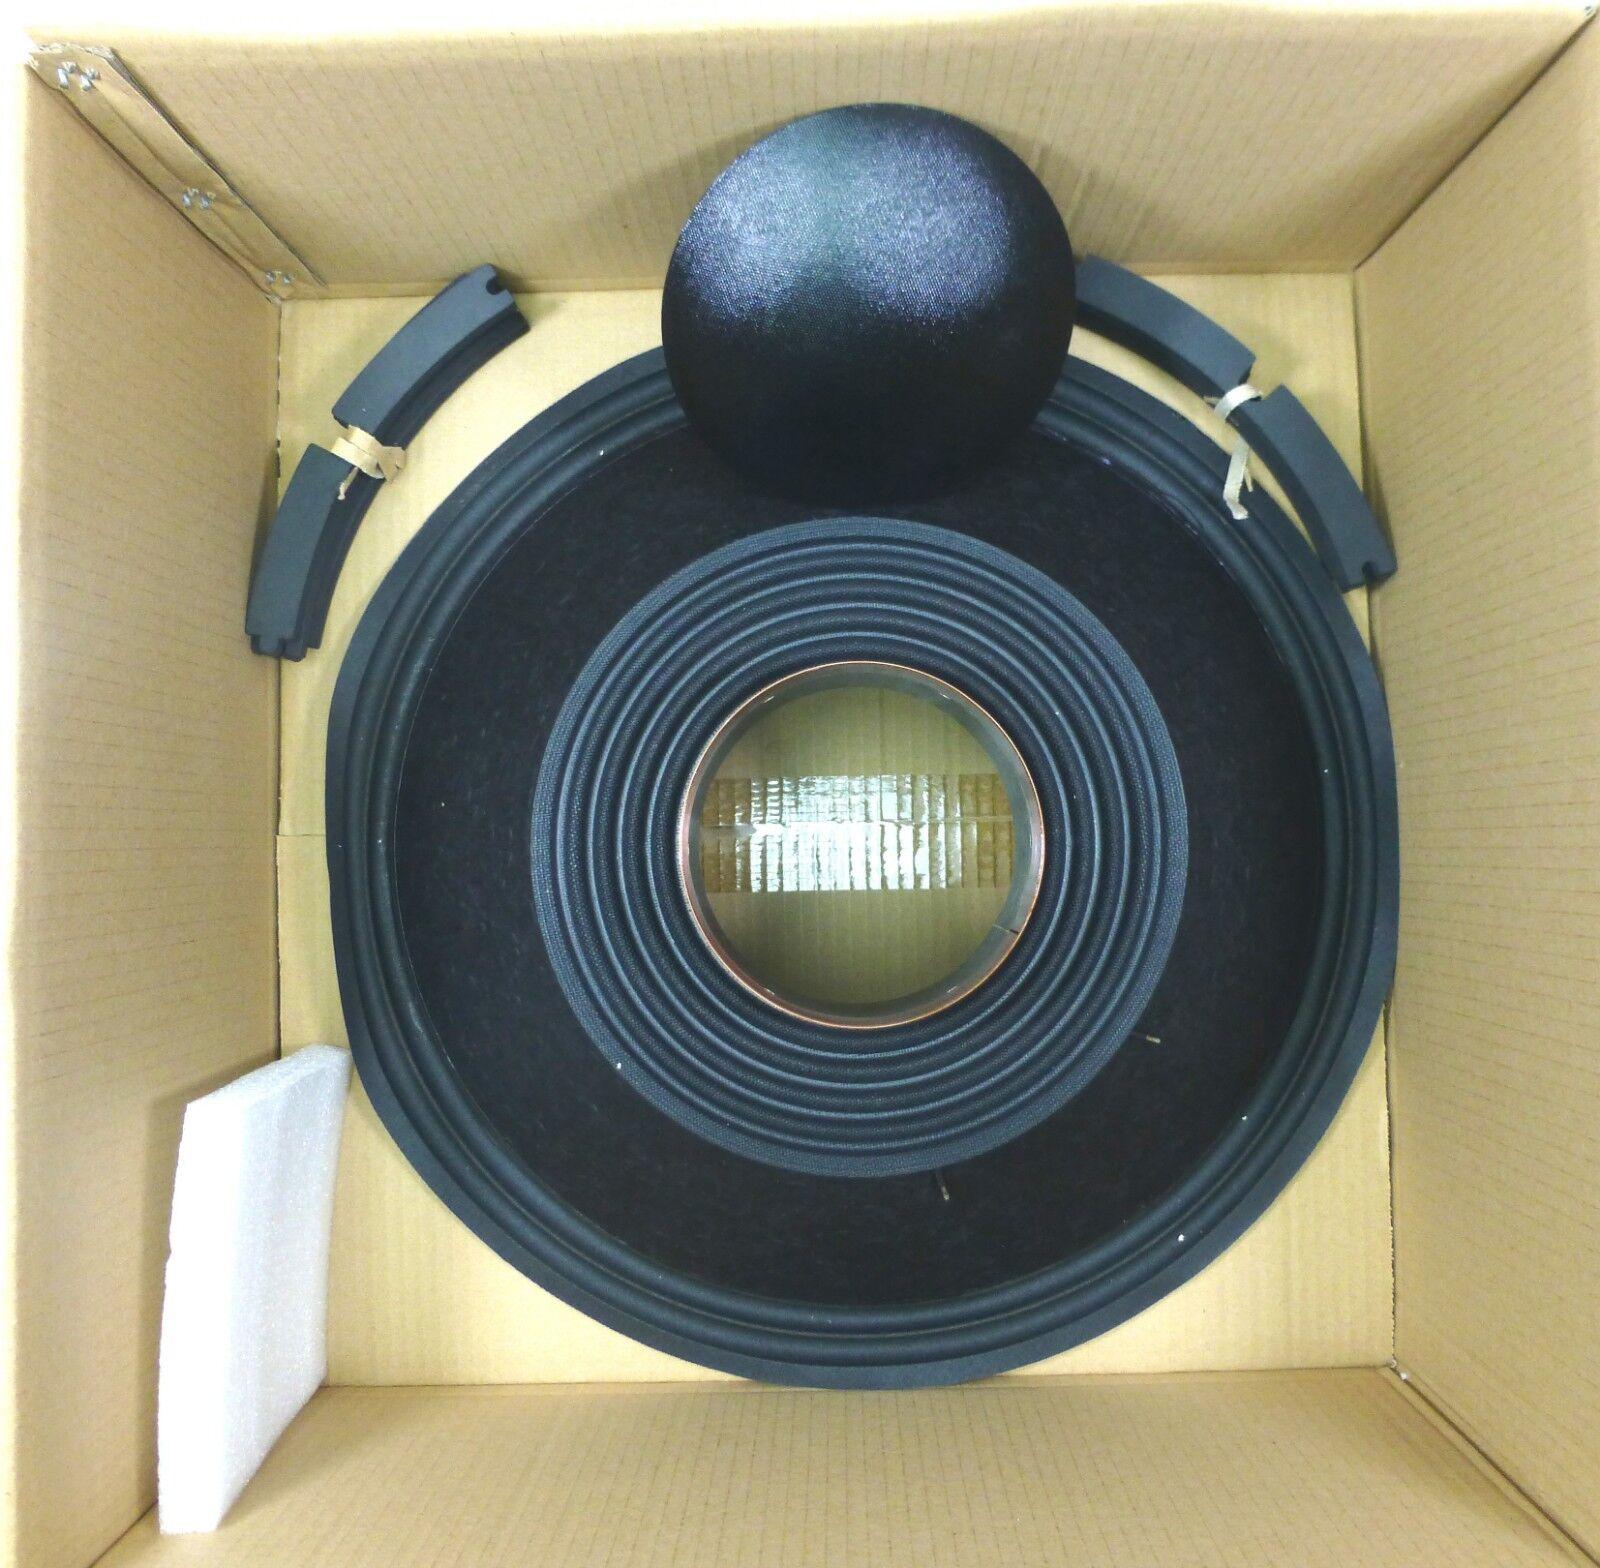 RK LASE 21LW-2400 21  Speaker 5  Voice Coil @ 8 Ohms ReCone Kit.